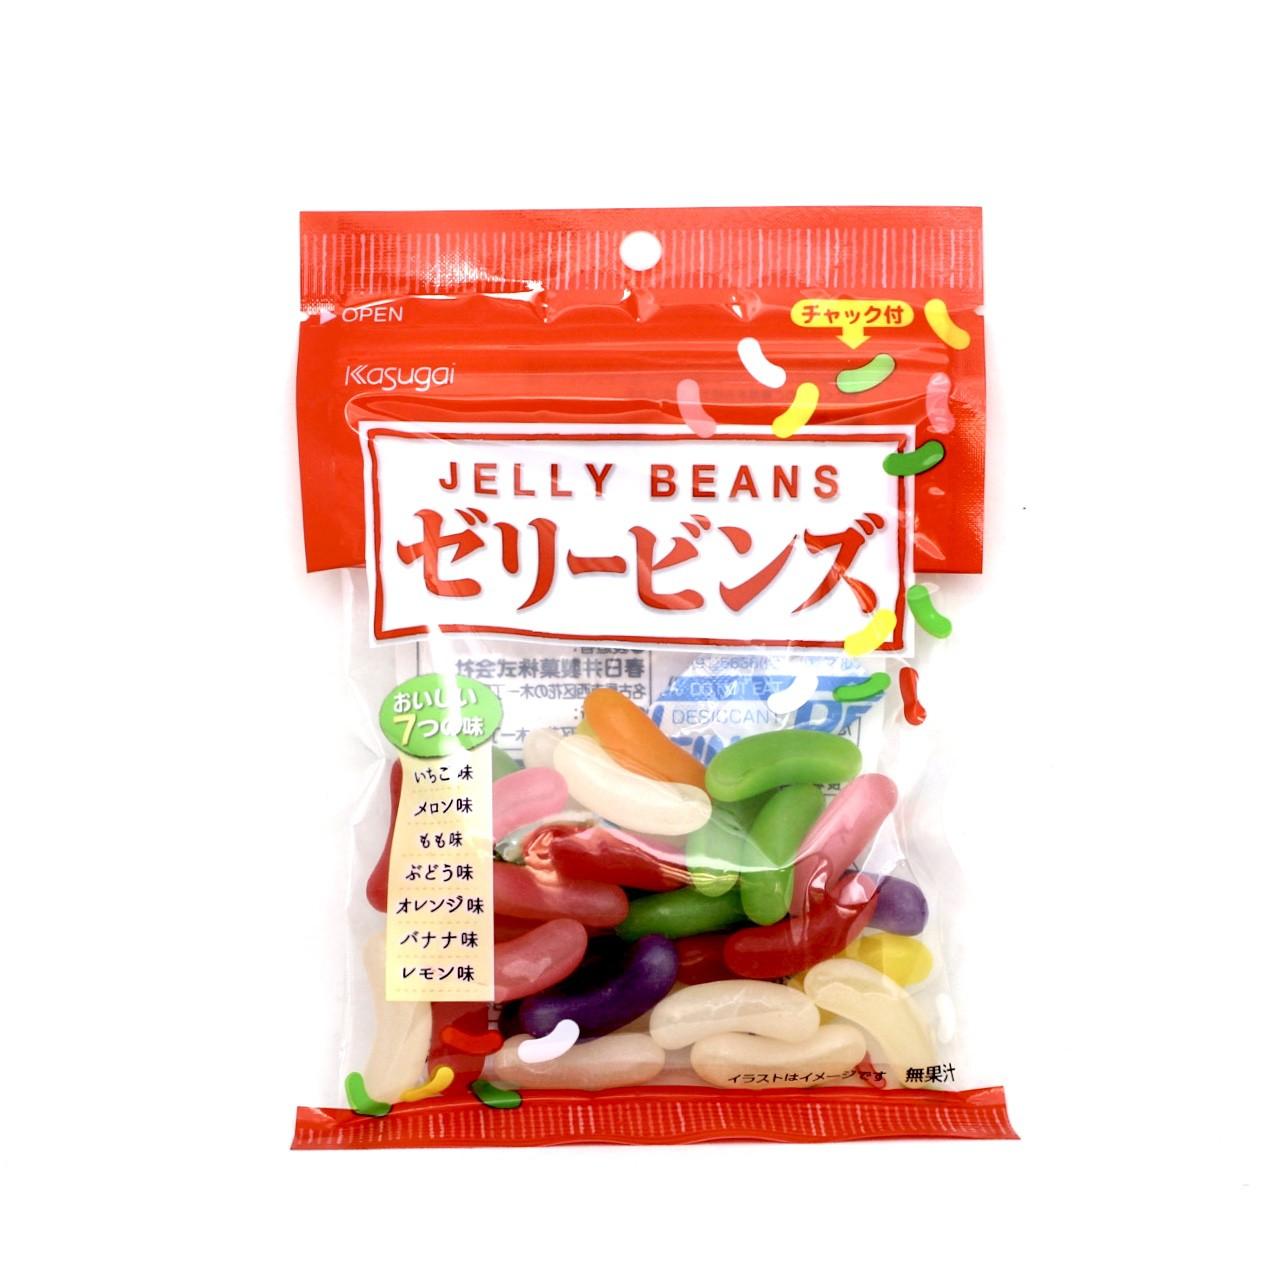 KASUGAI JELLY BEANS CANDY 95g